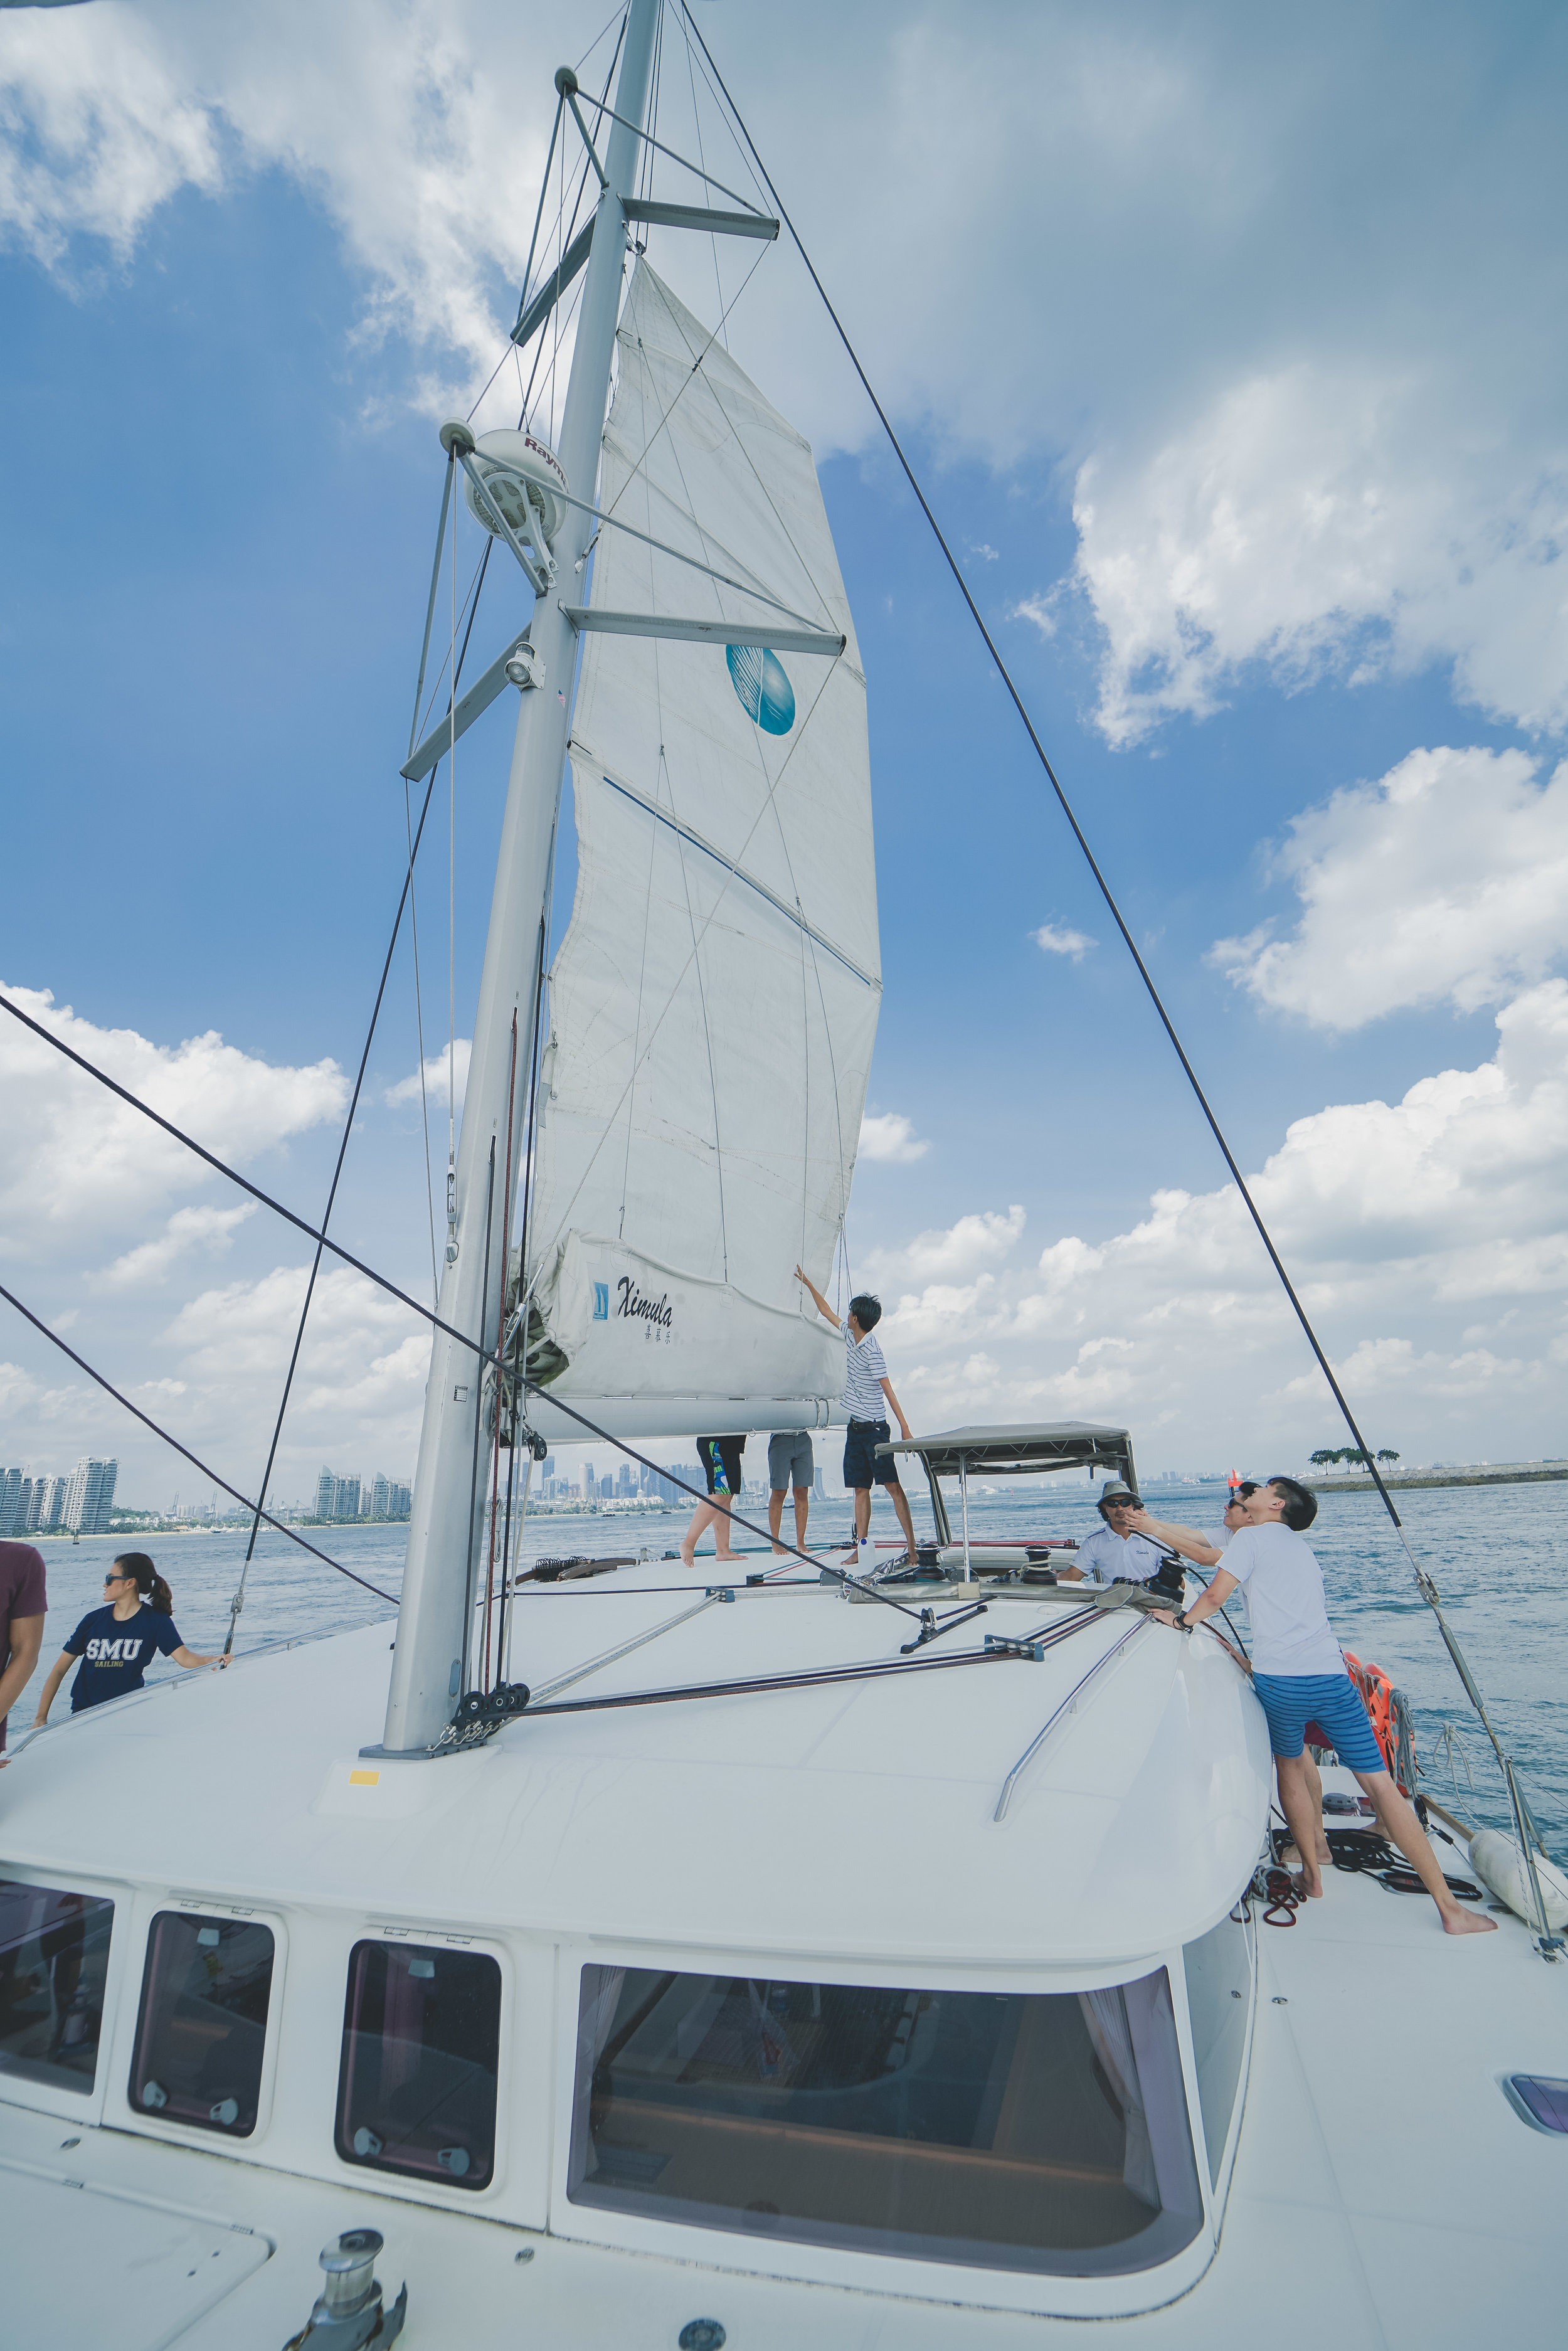 Ximula experiential sailing-1027.jpg